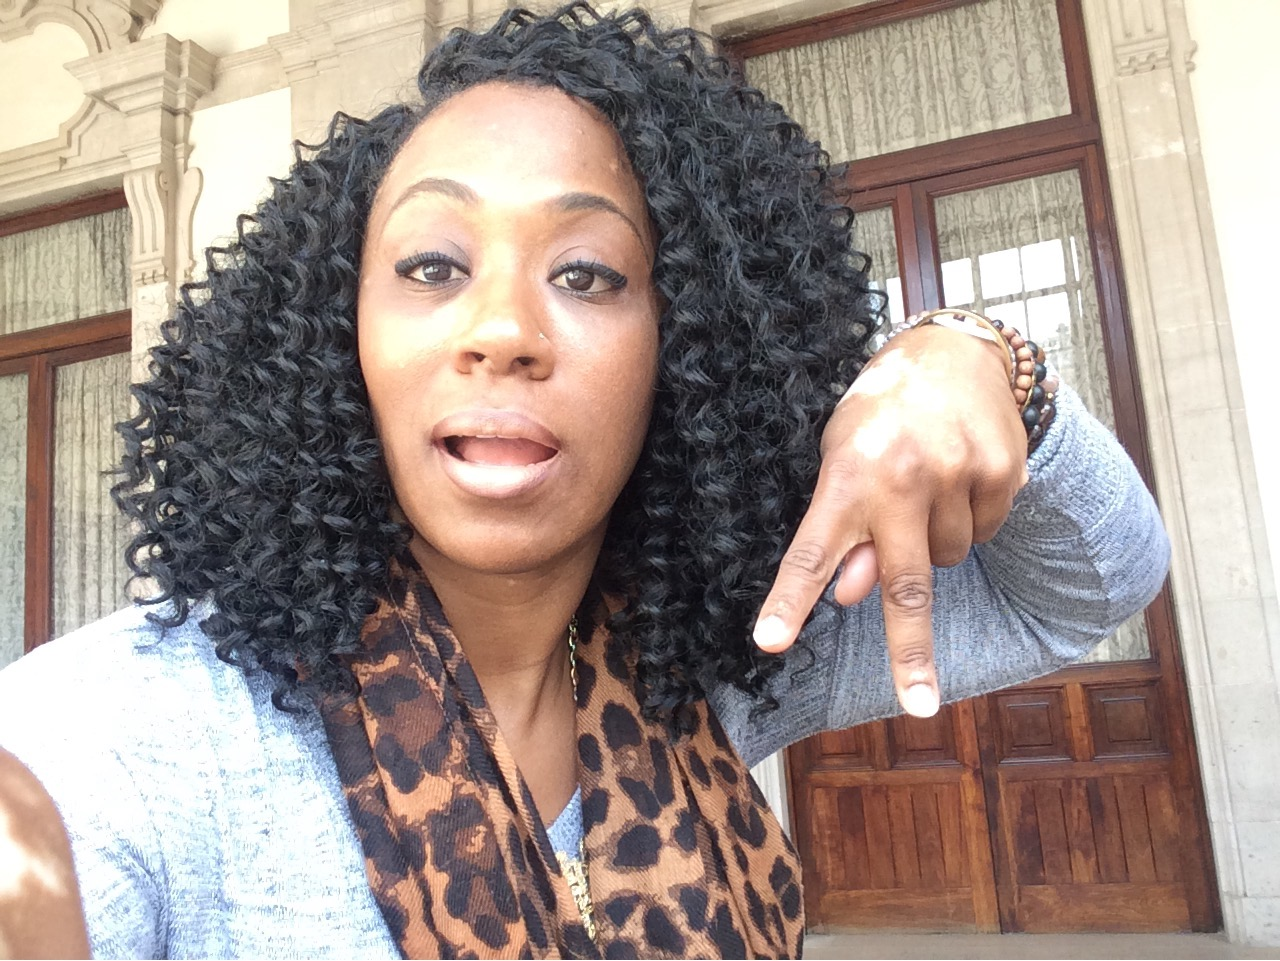 dayka-robinson-blog-madrid-spain-solo-travel-europe-black-woman-american-palacio-real-oct-2016